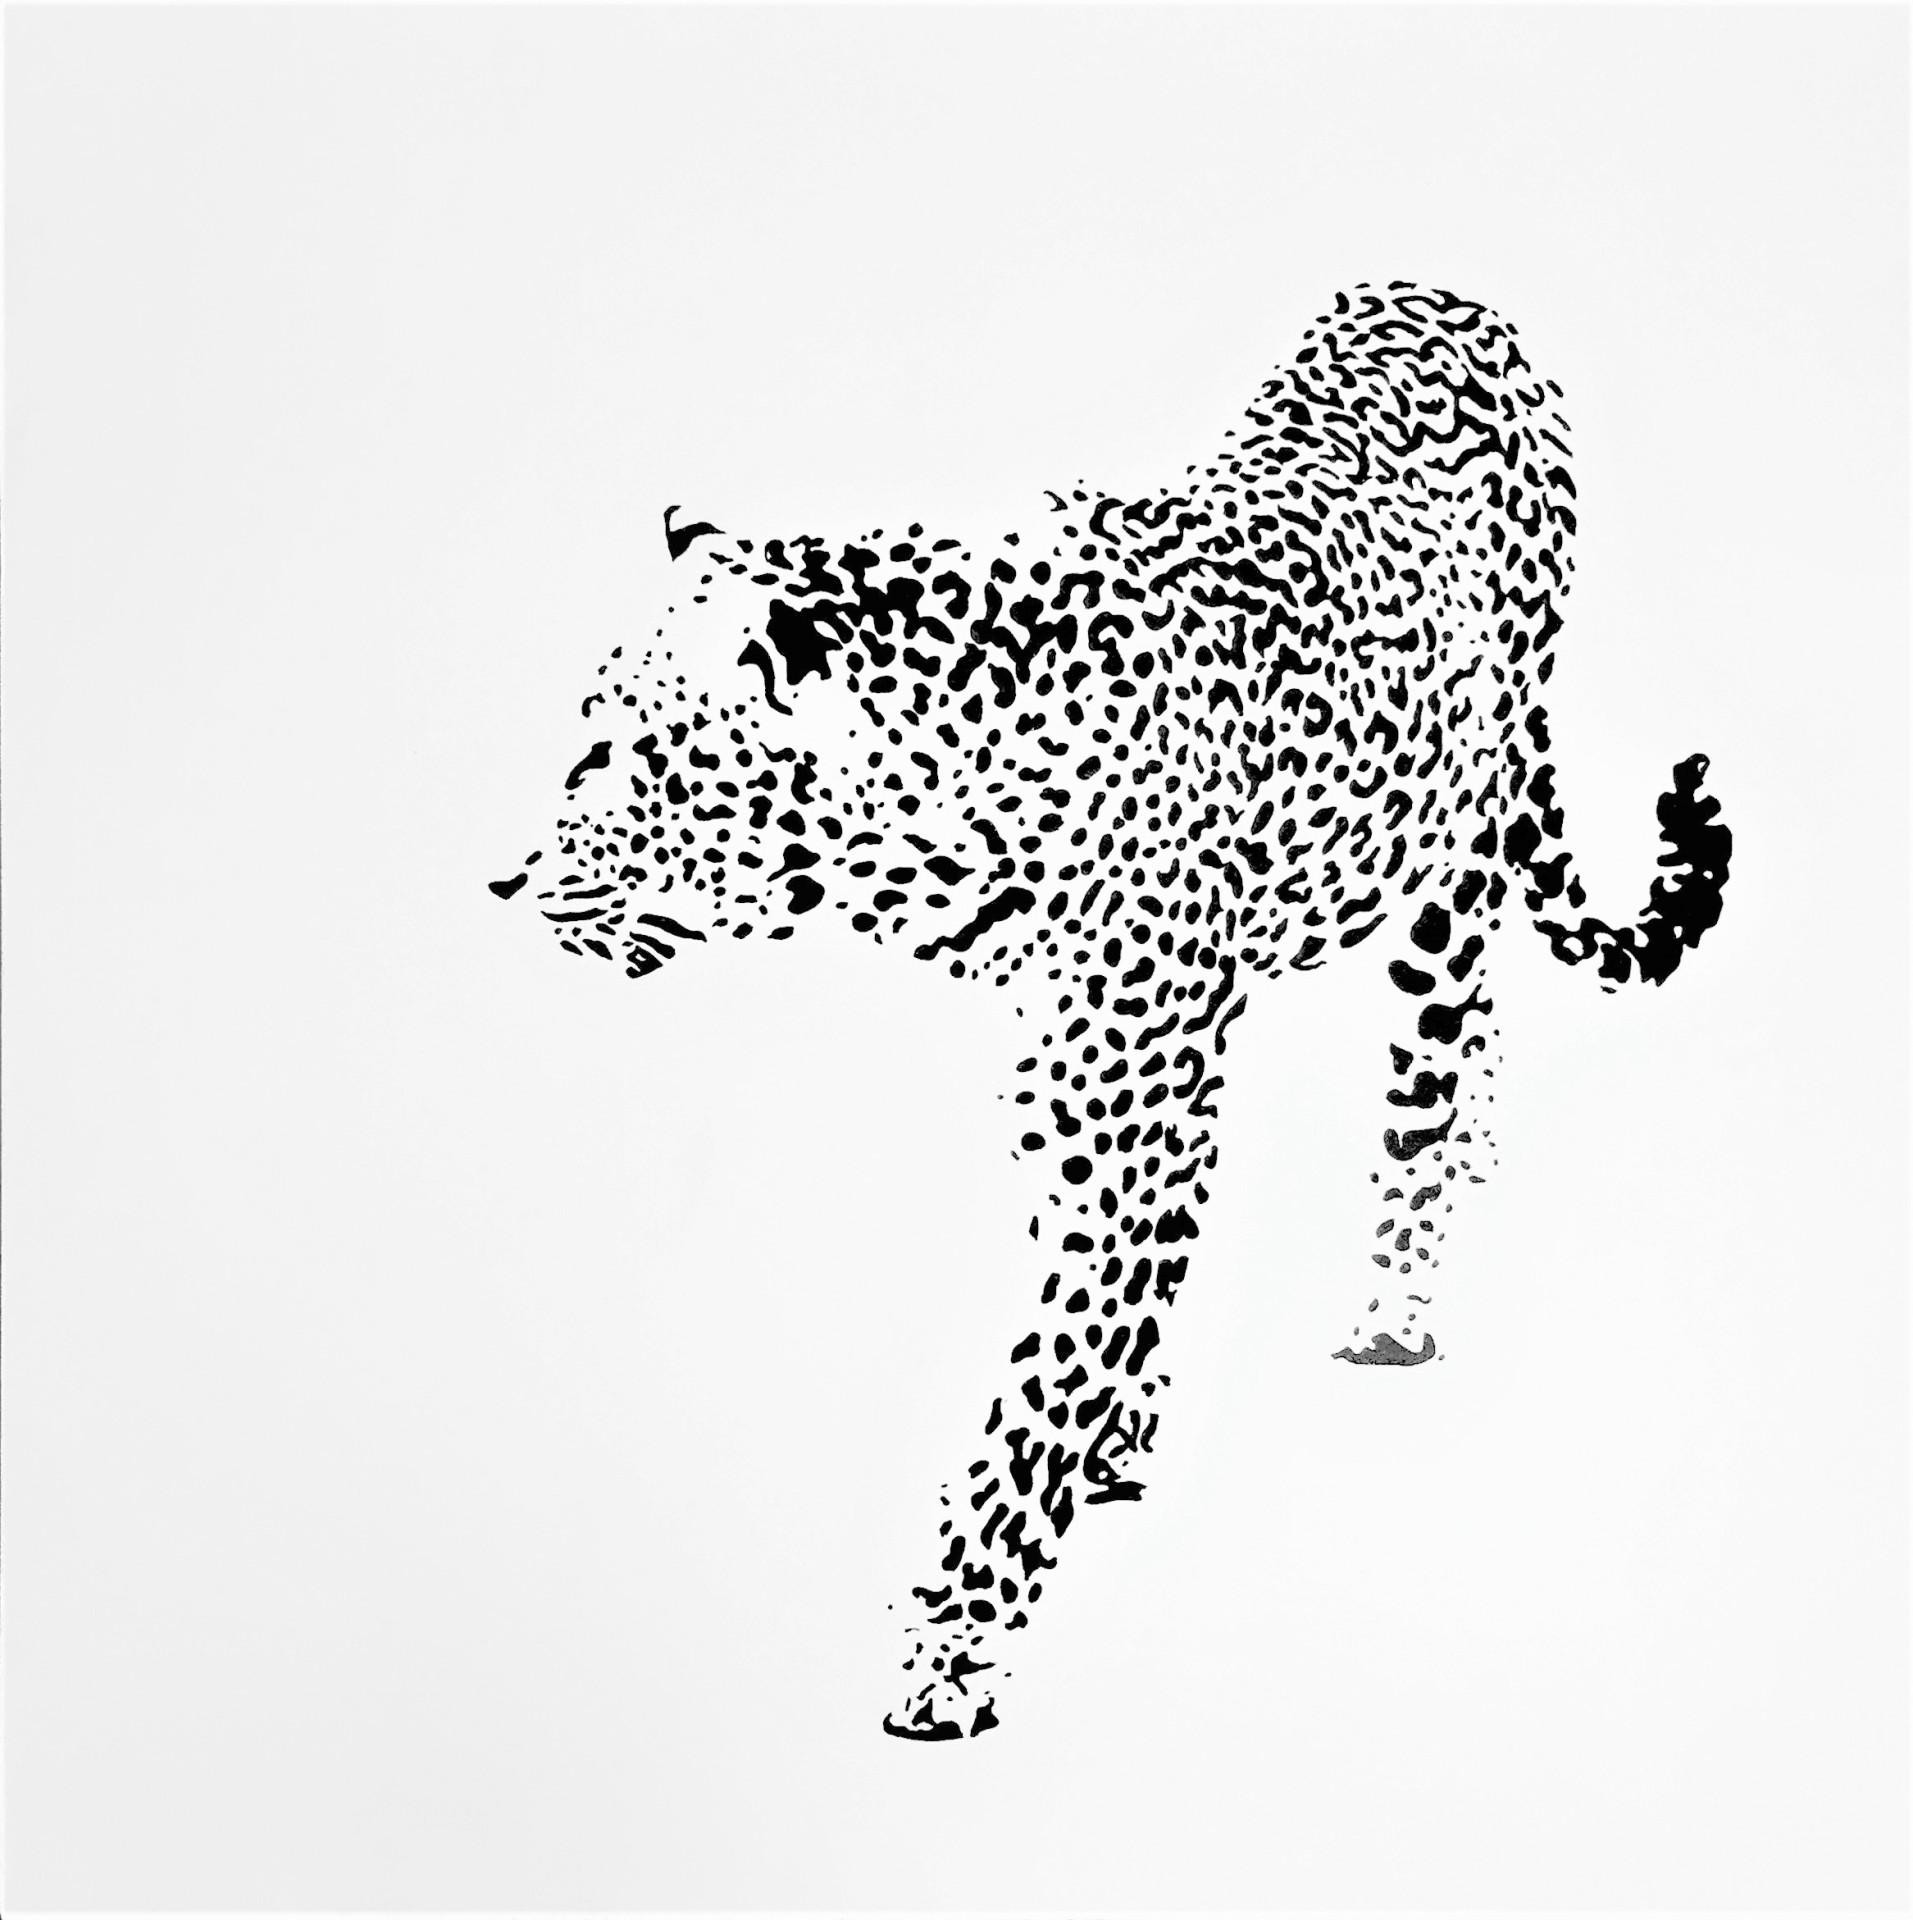 Leopard Searching